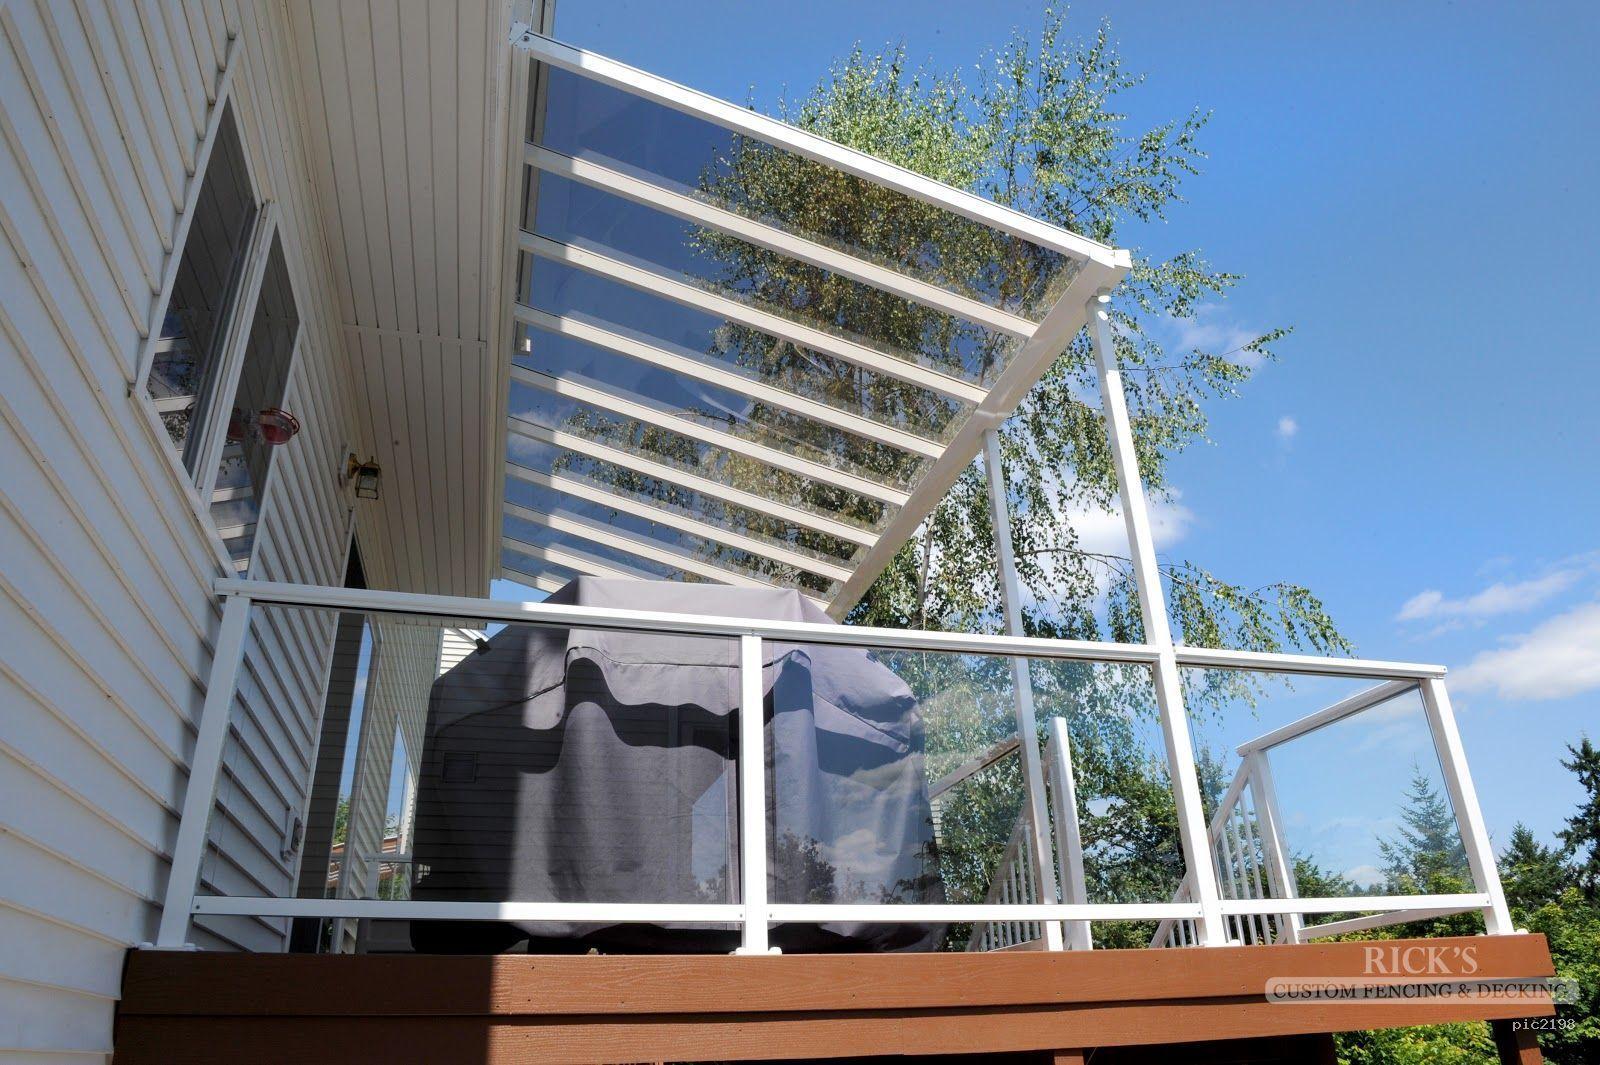 Aluminum Patio Covers & Aluminum Patio Cover Kits | Ricksfencing.com